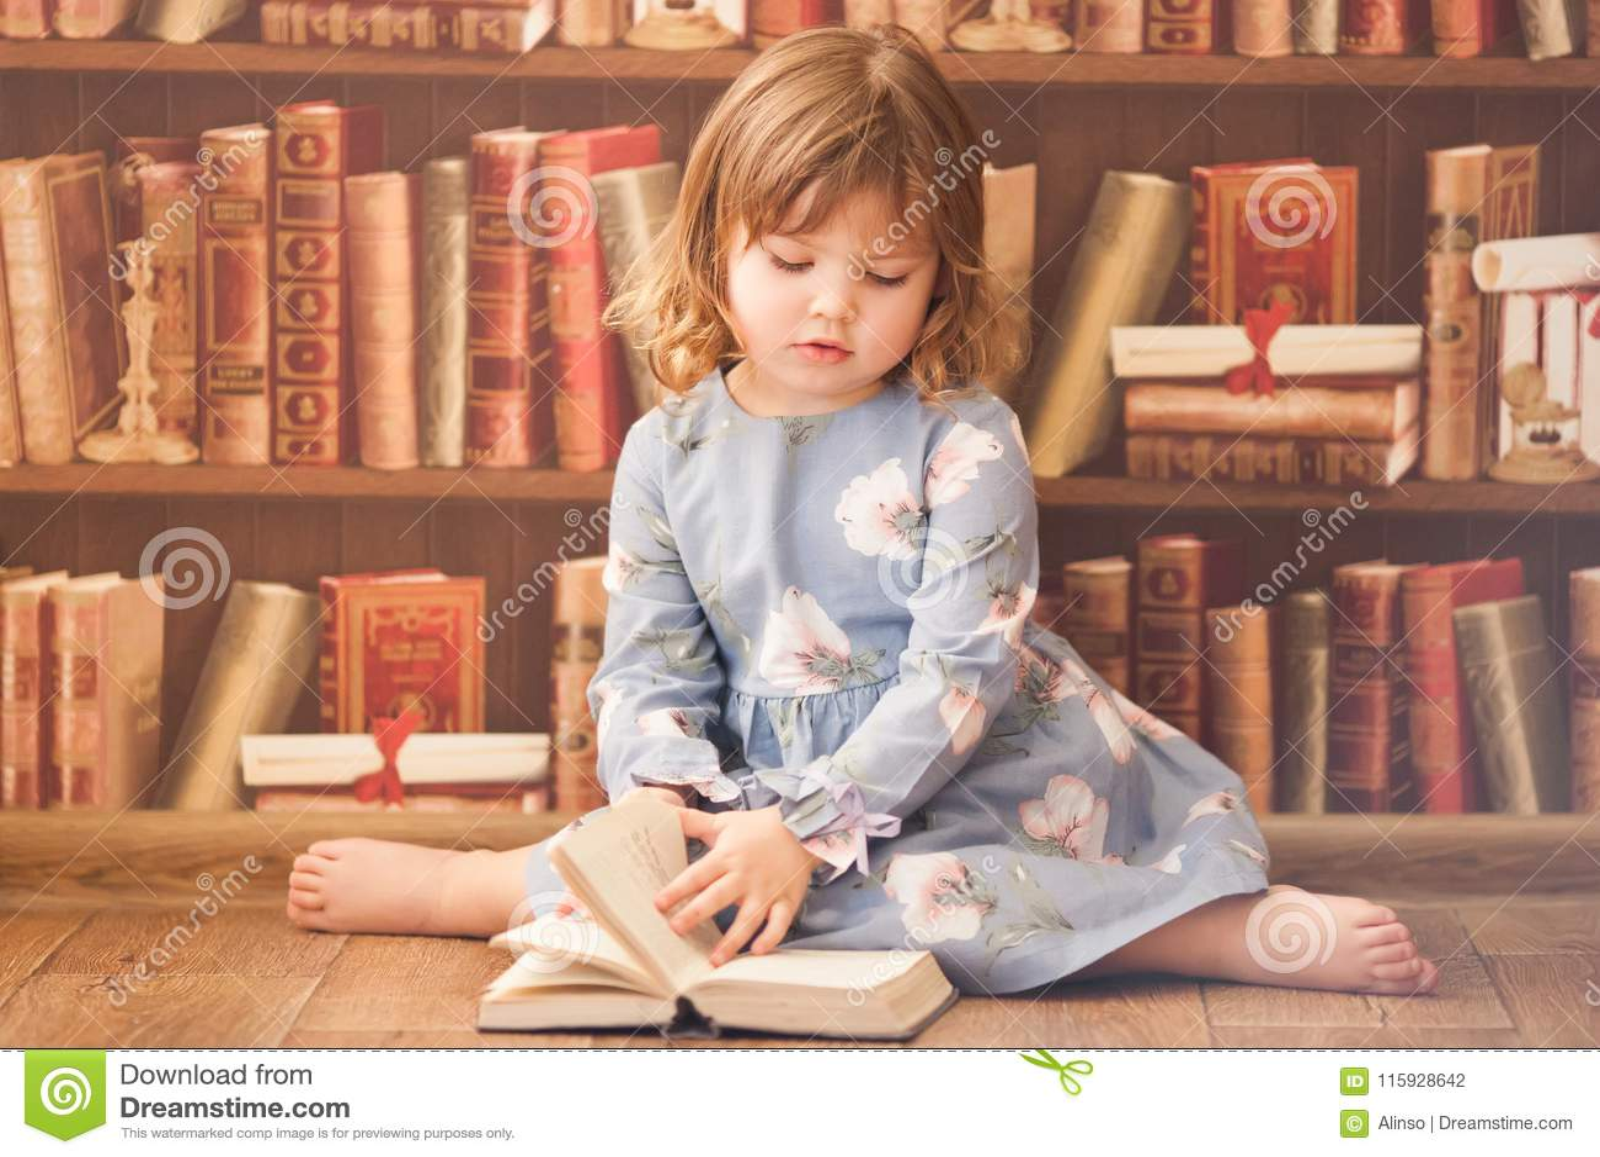 Adorable little bookworm girl reading books.